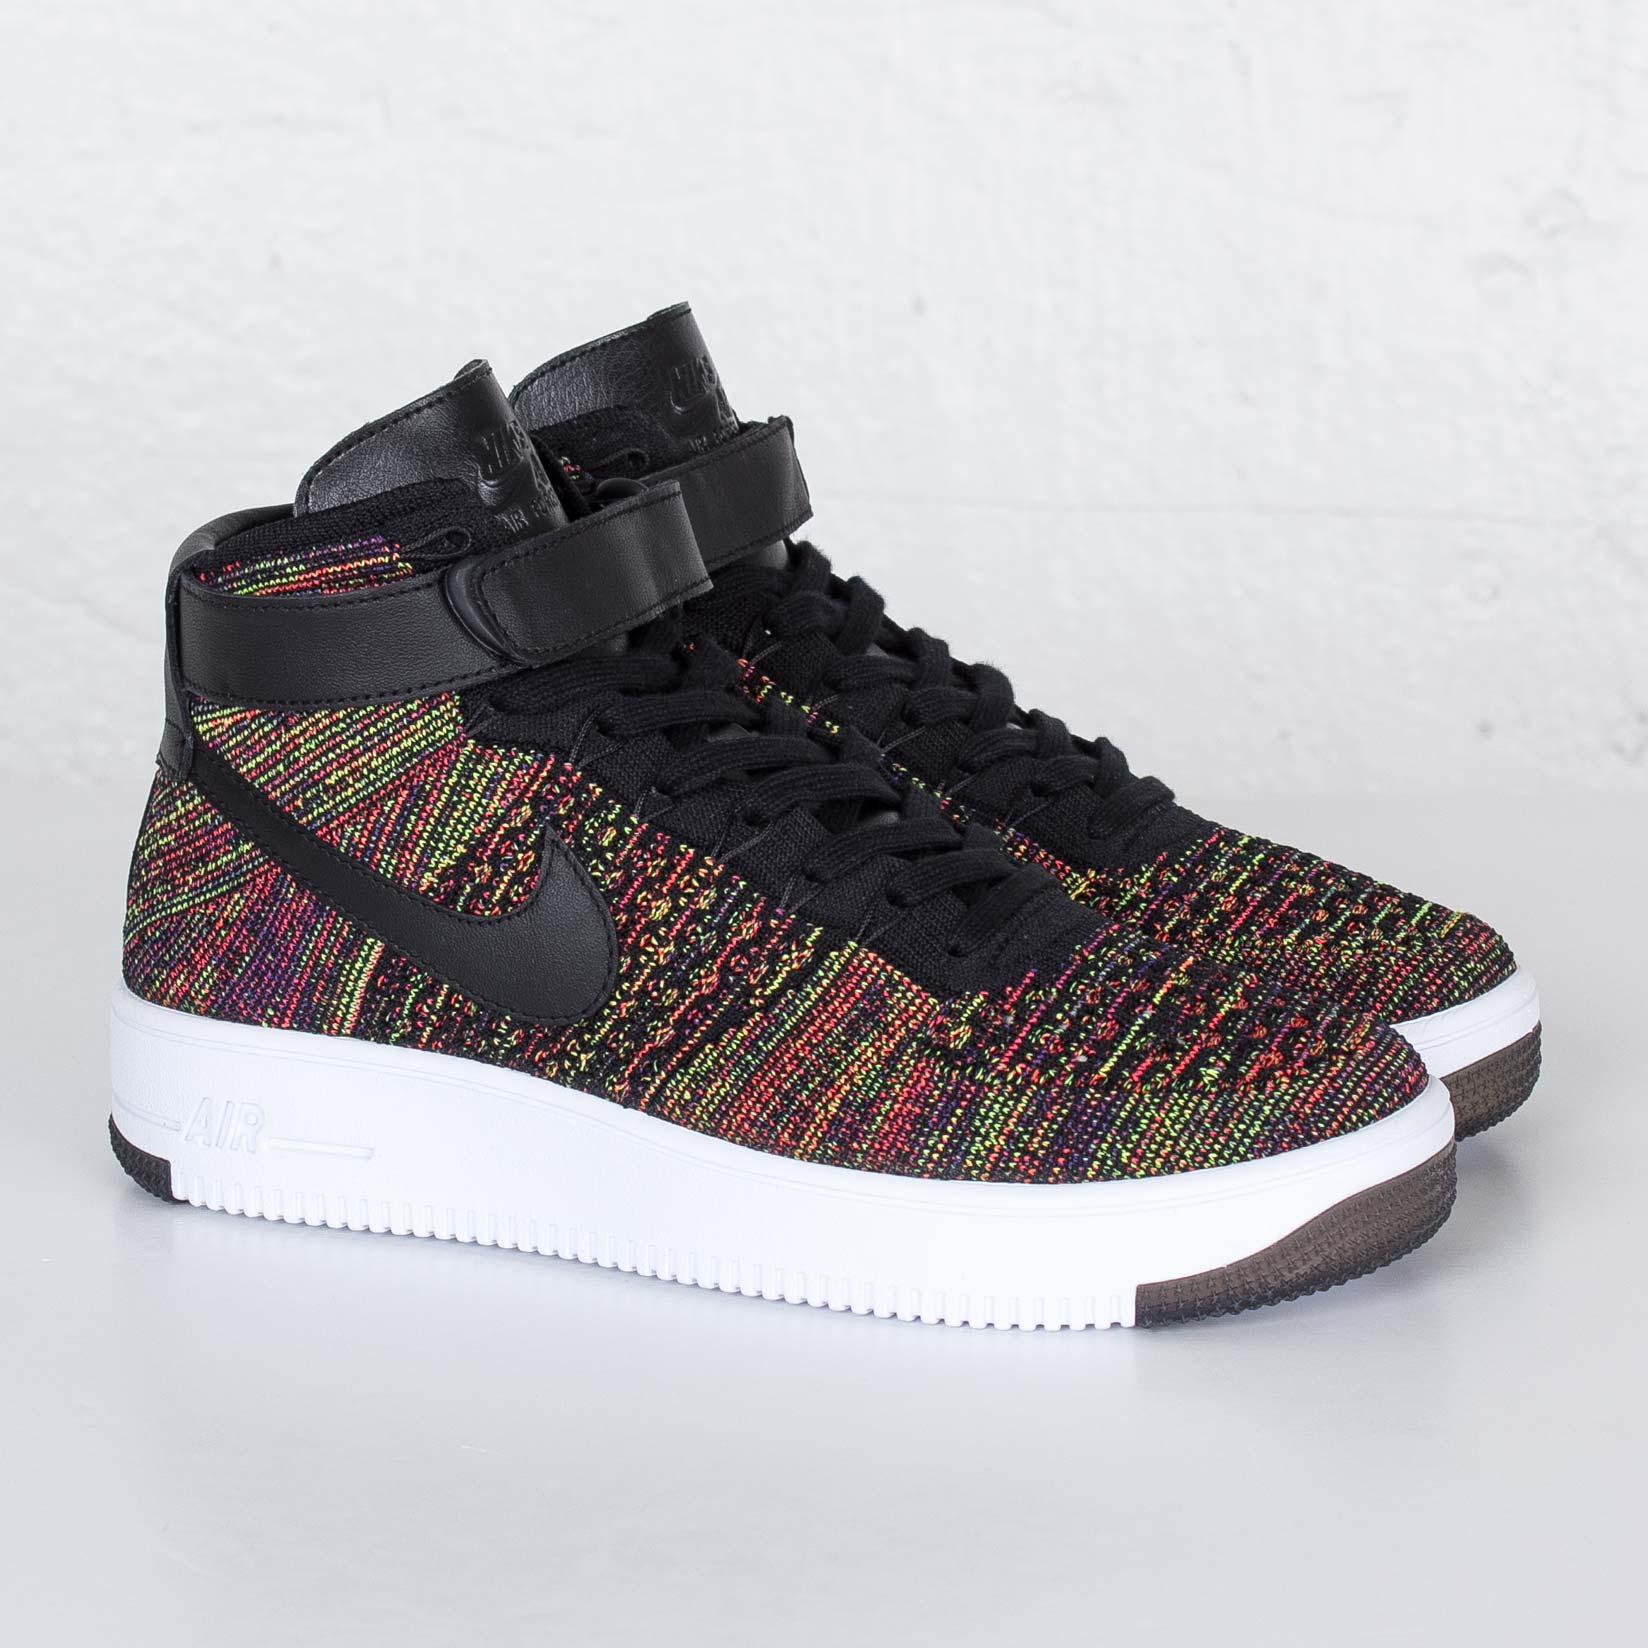 dca1588251 Nike AF1 Ultra Flyknit Mid - 817420-002 - Sneakersnstuff | sneakers ...